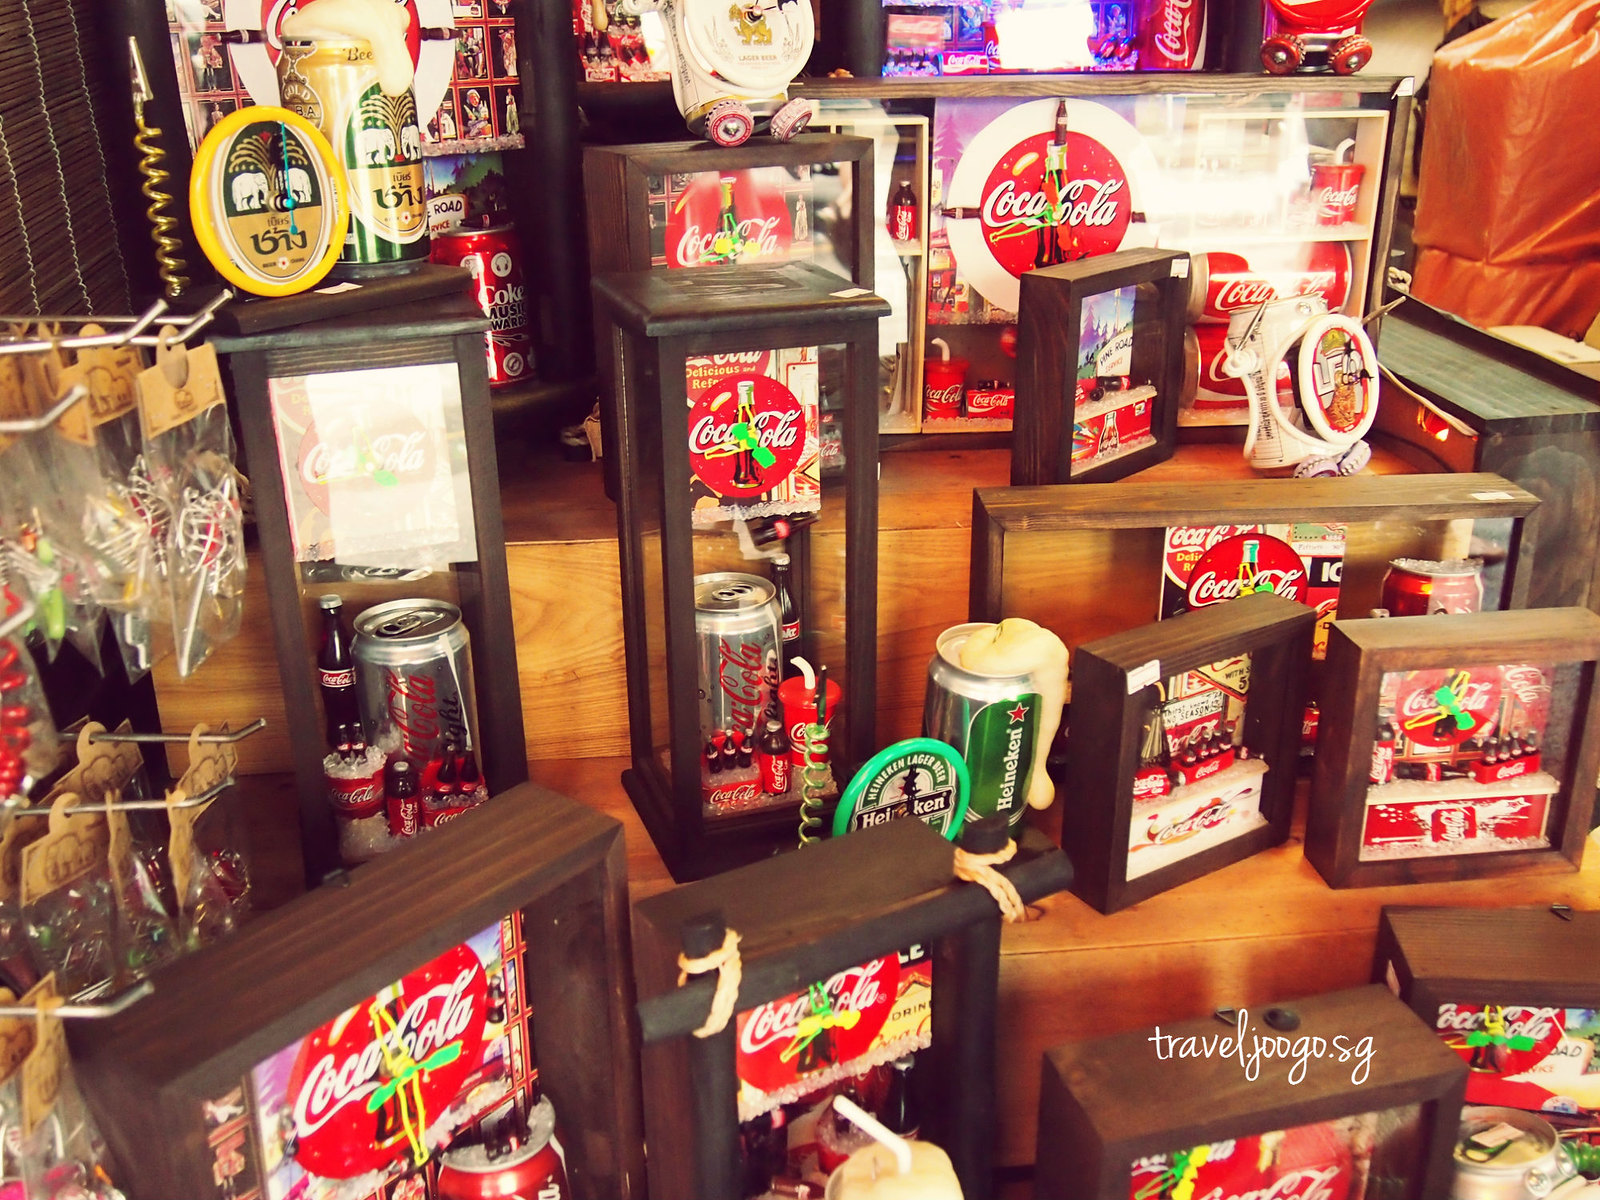 chatuchak shop -travel.joogostyle.com